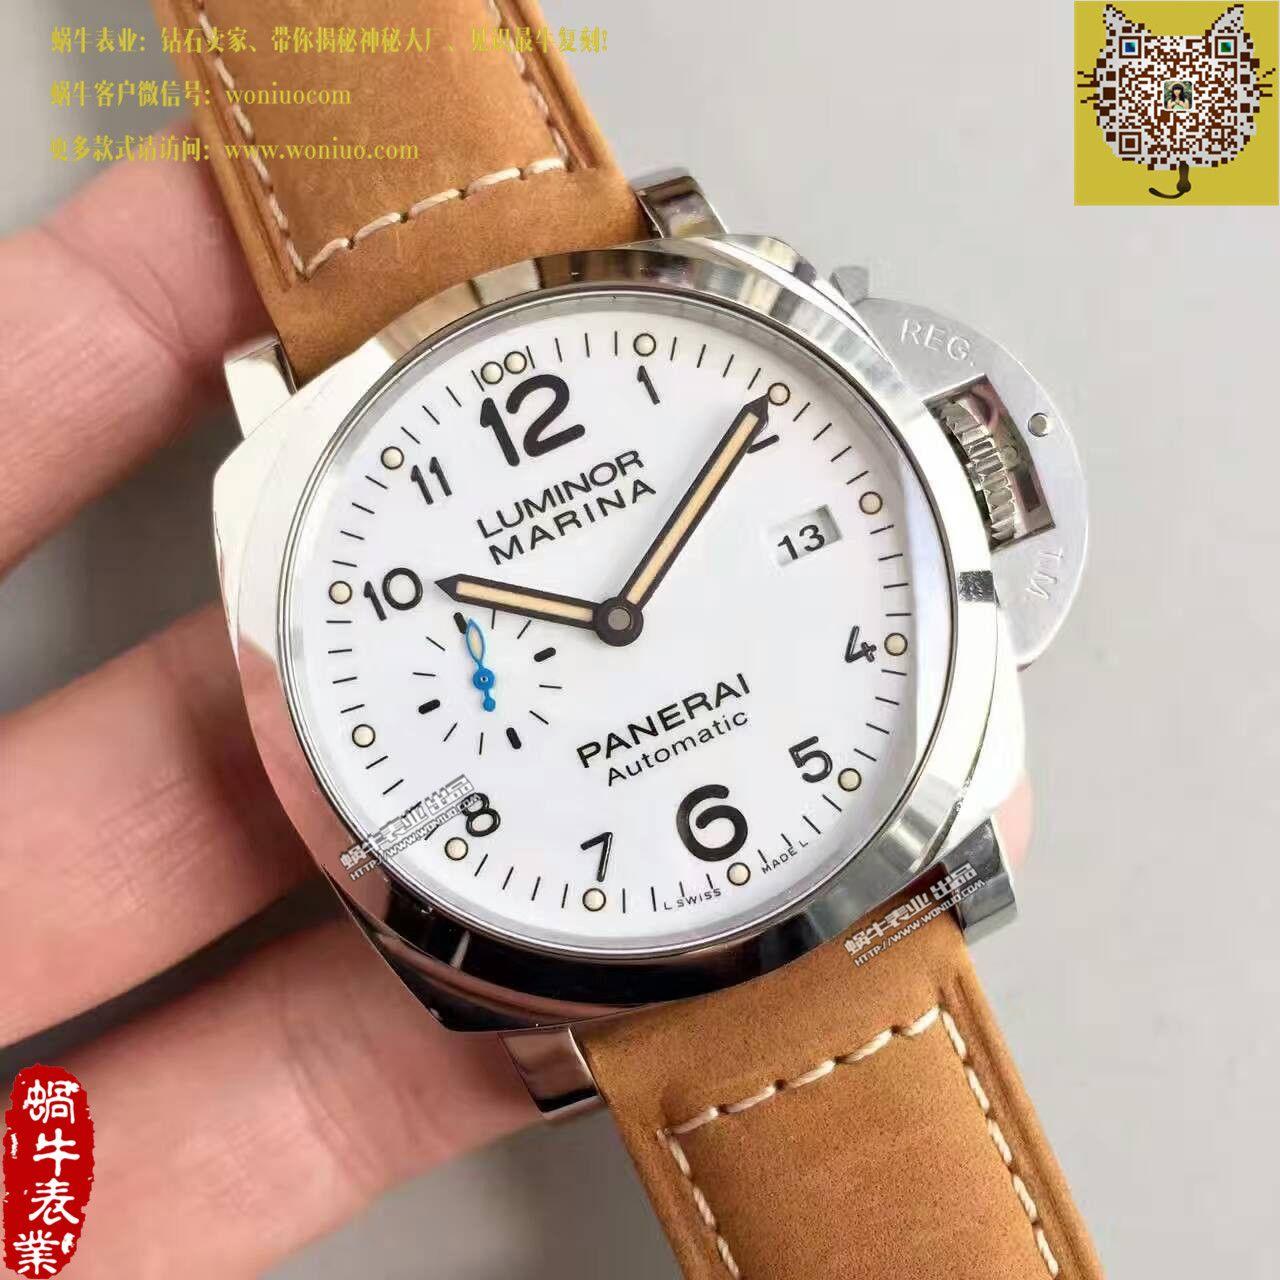 【ZF一比一超A高仿手表】沛纳海LUMINOR 1950系列PAM01499腕表